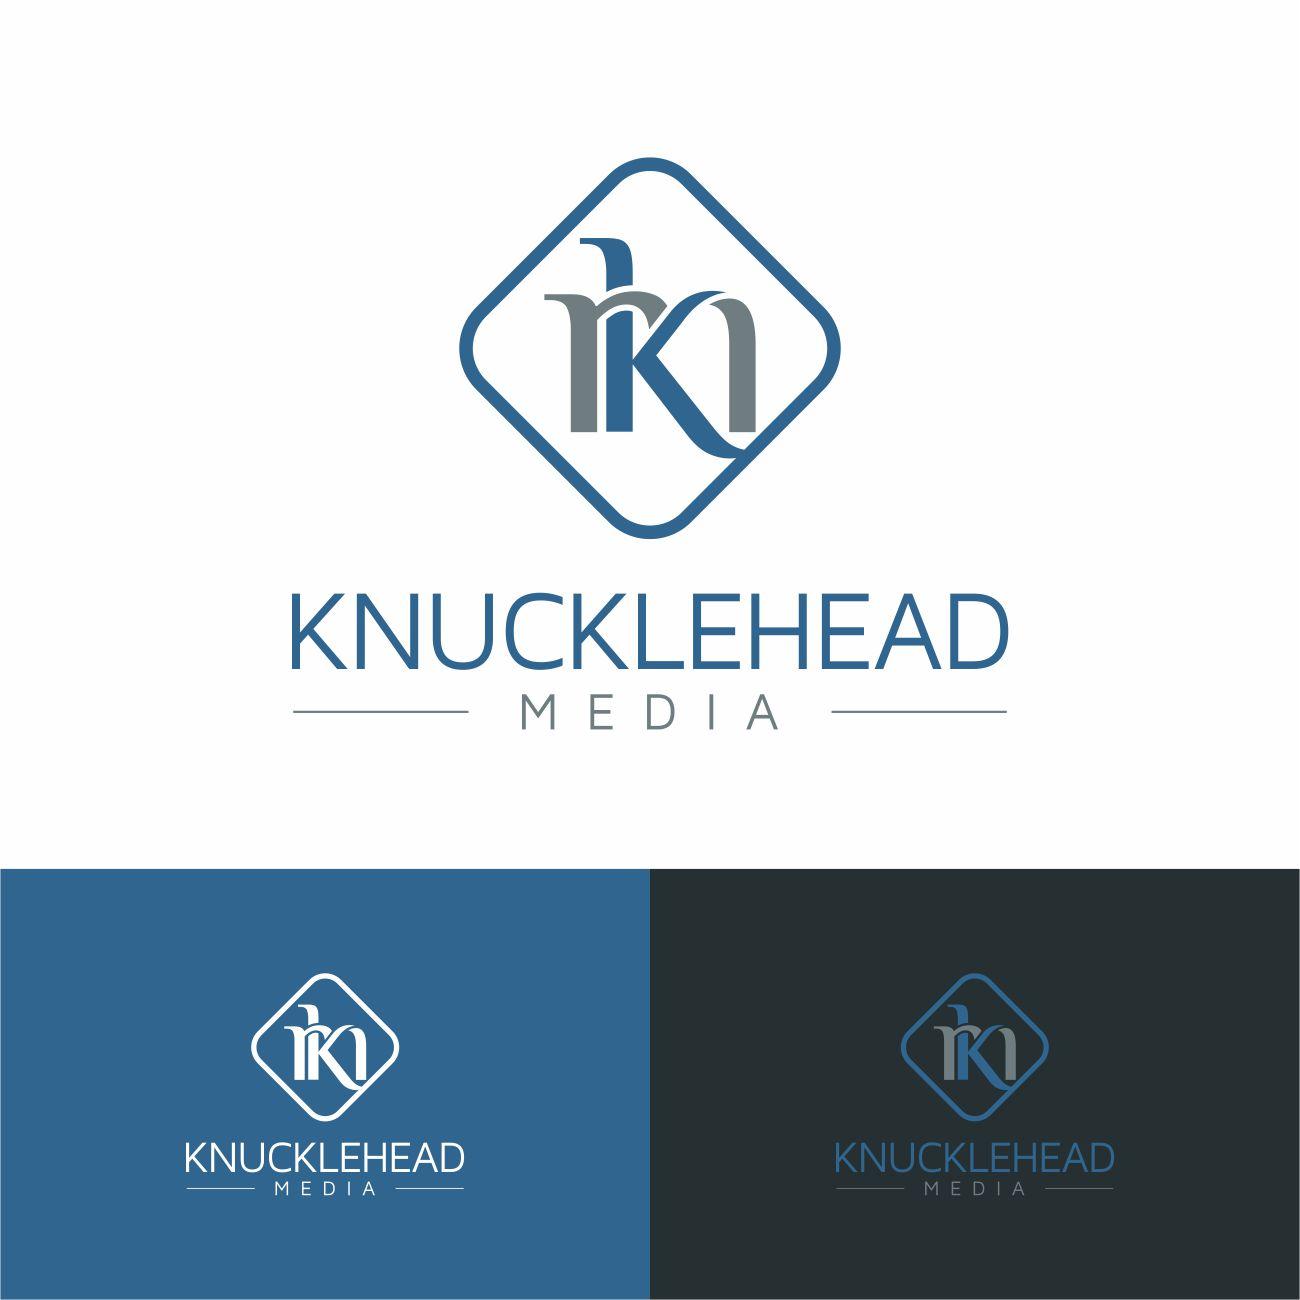 Logo Design by RasYa Muhammad Athaya - Entry No. 26 in the Logo Design Contest Imaginative Logo Design for knucklehead media.